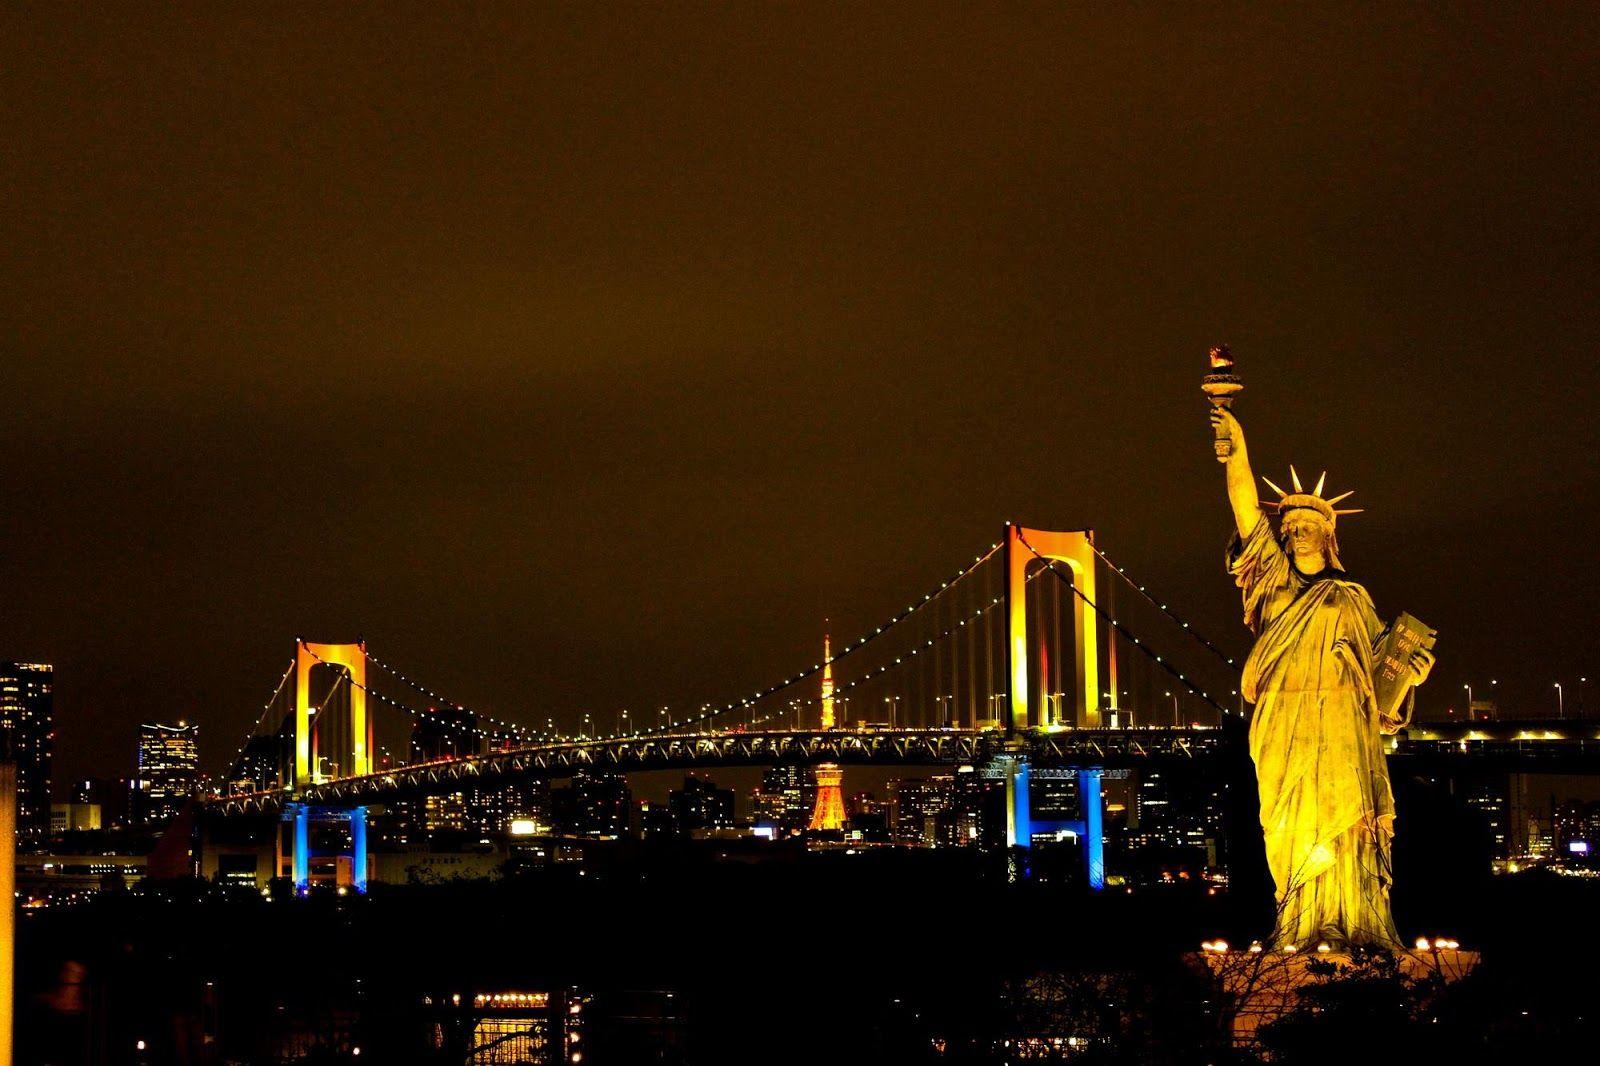 Statue Of Liberty Wallpaper At Night 02 New York Statue Places To Visit Cool Places To Visit